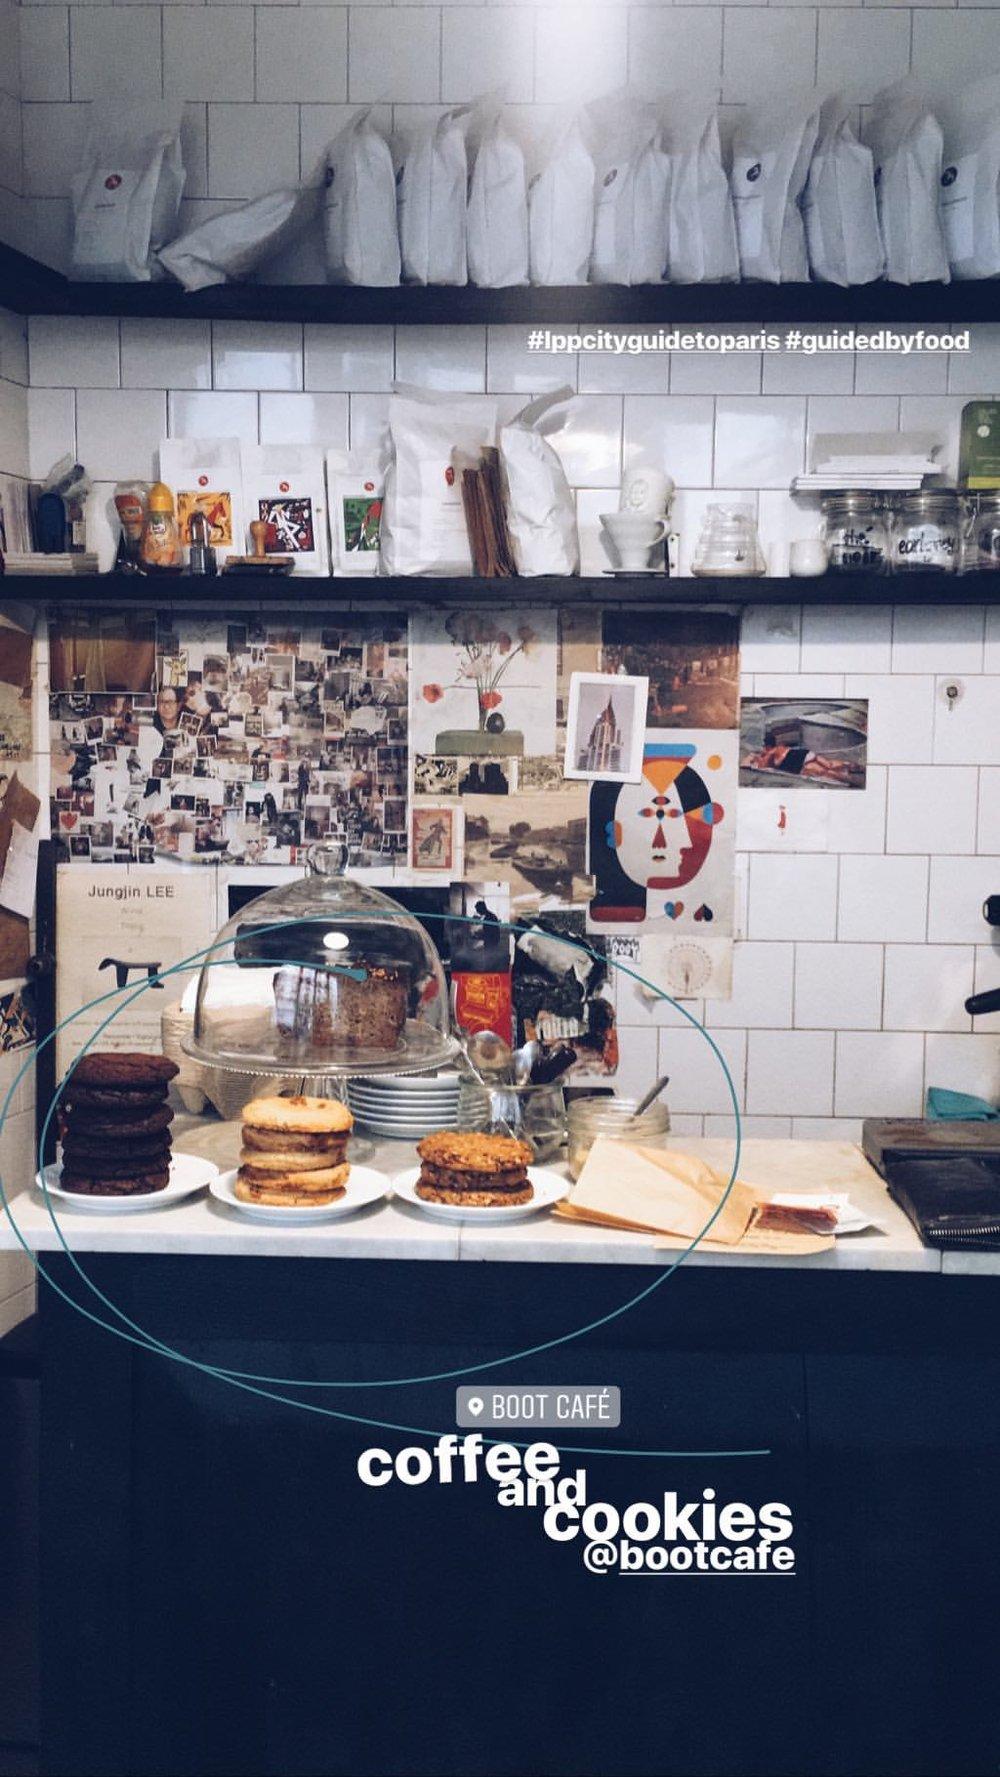 PARIS-FOOD-BOOTCAFE-COFFEE-3.jpg